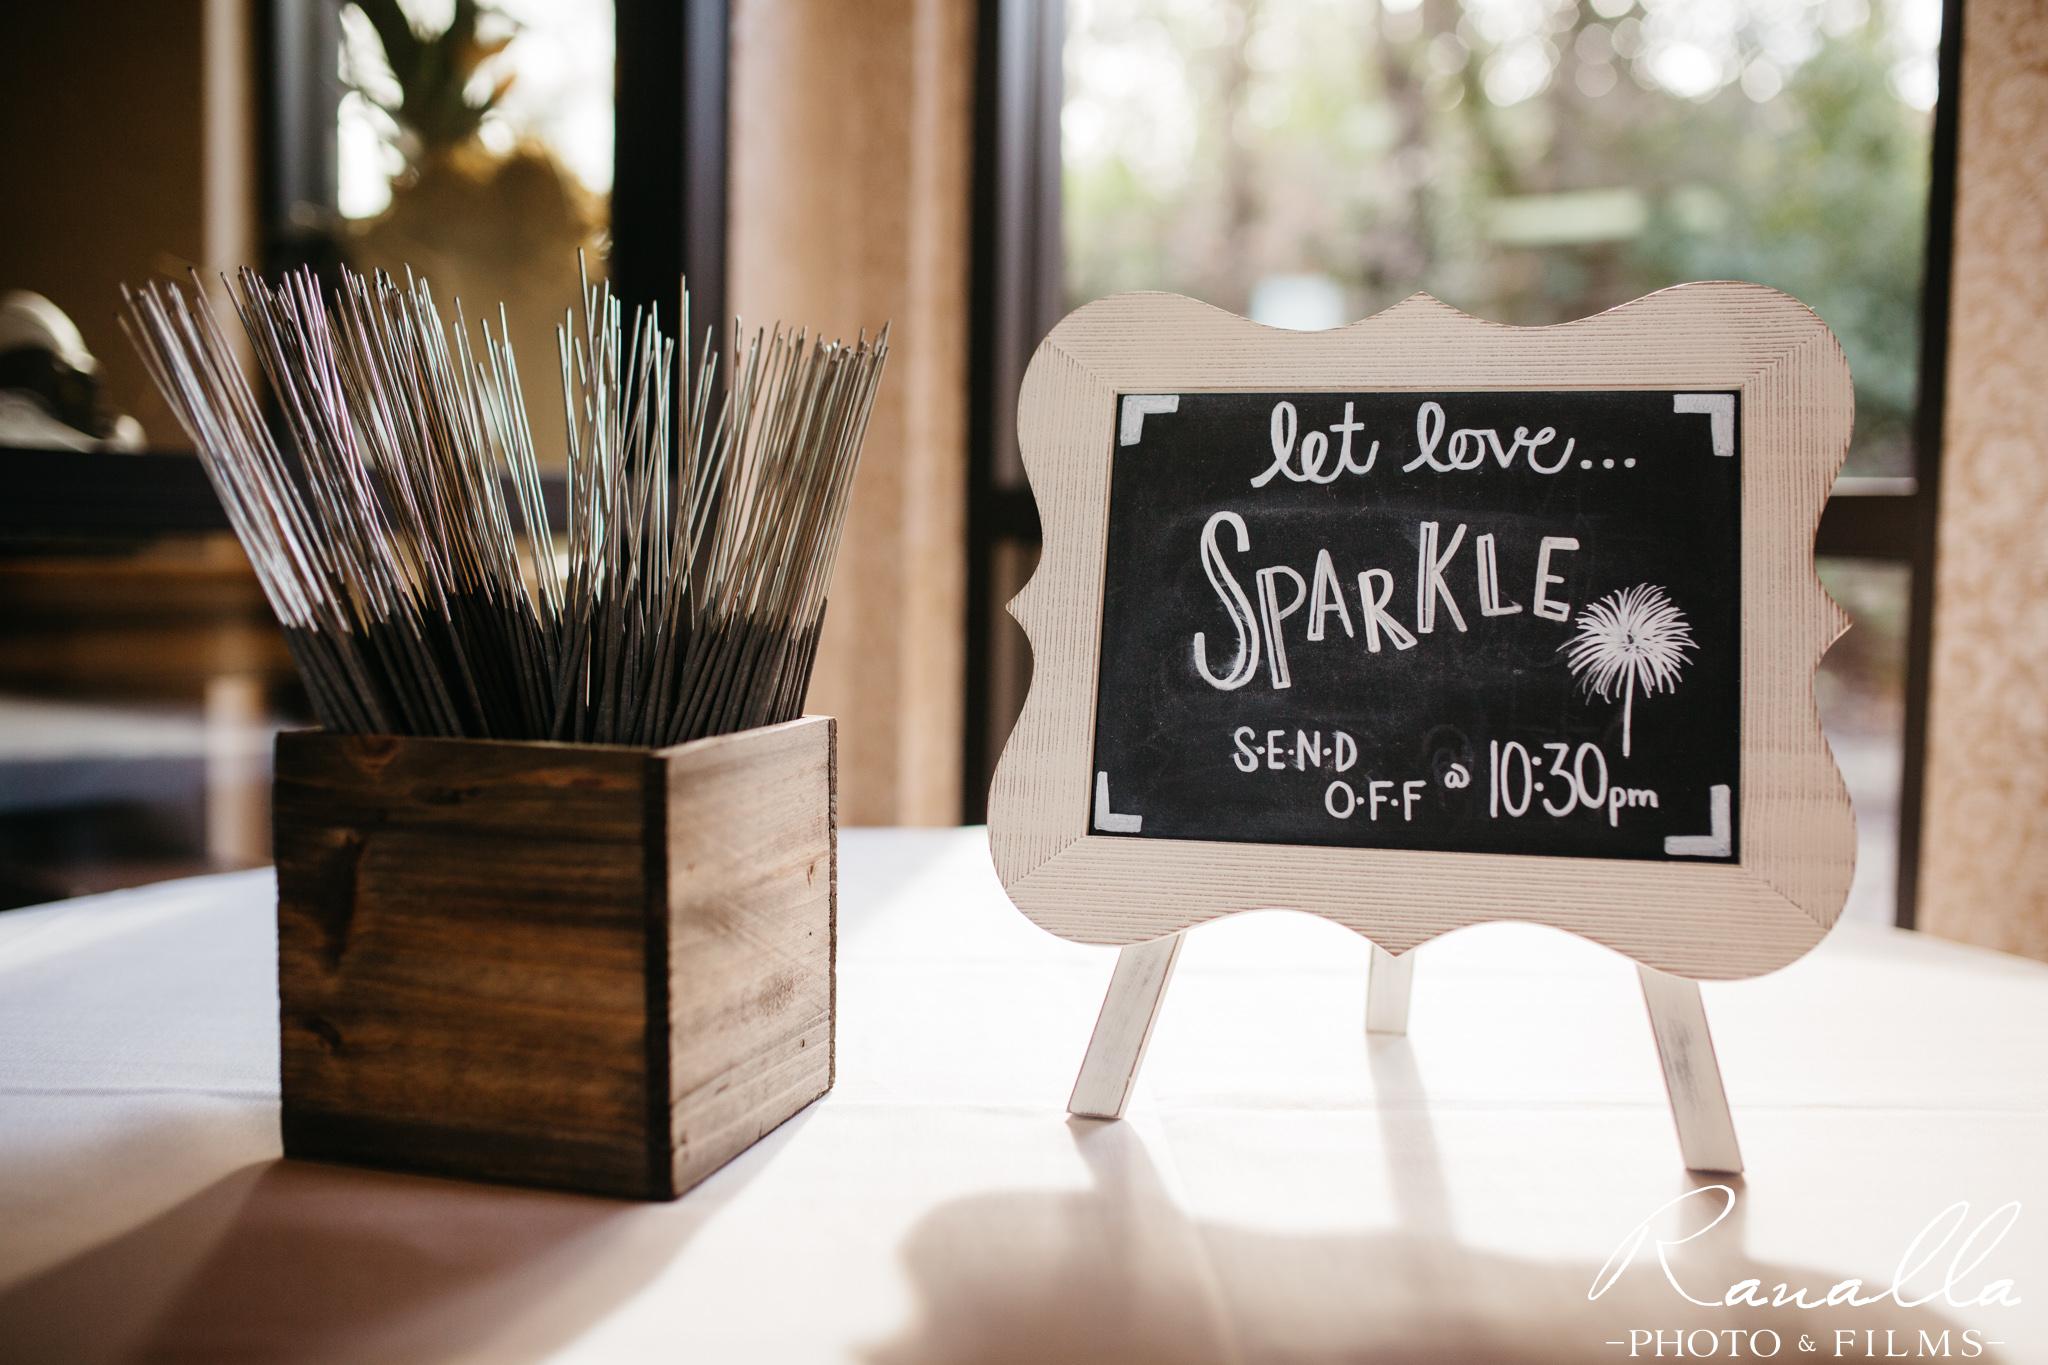 wedding-sparkler-exit-table-chico-wedding-photography-ranalla-photo-films